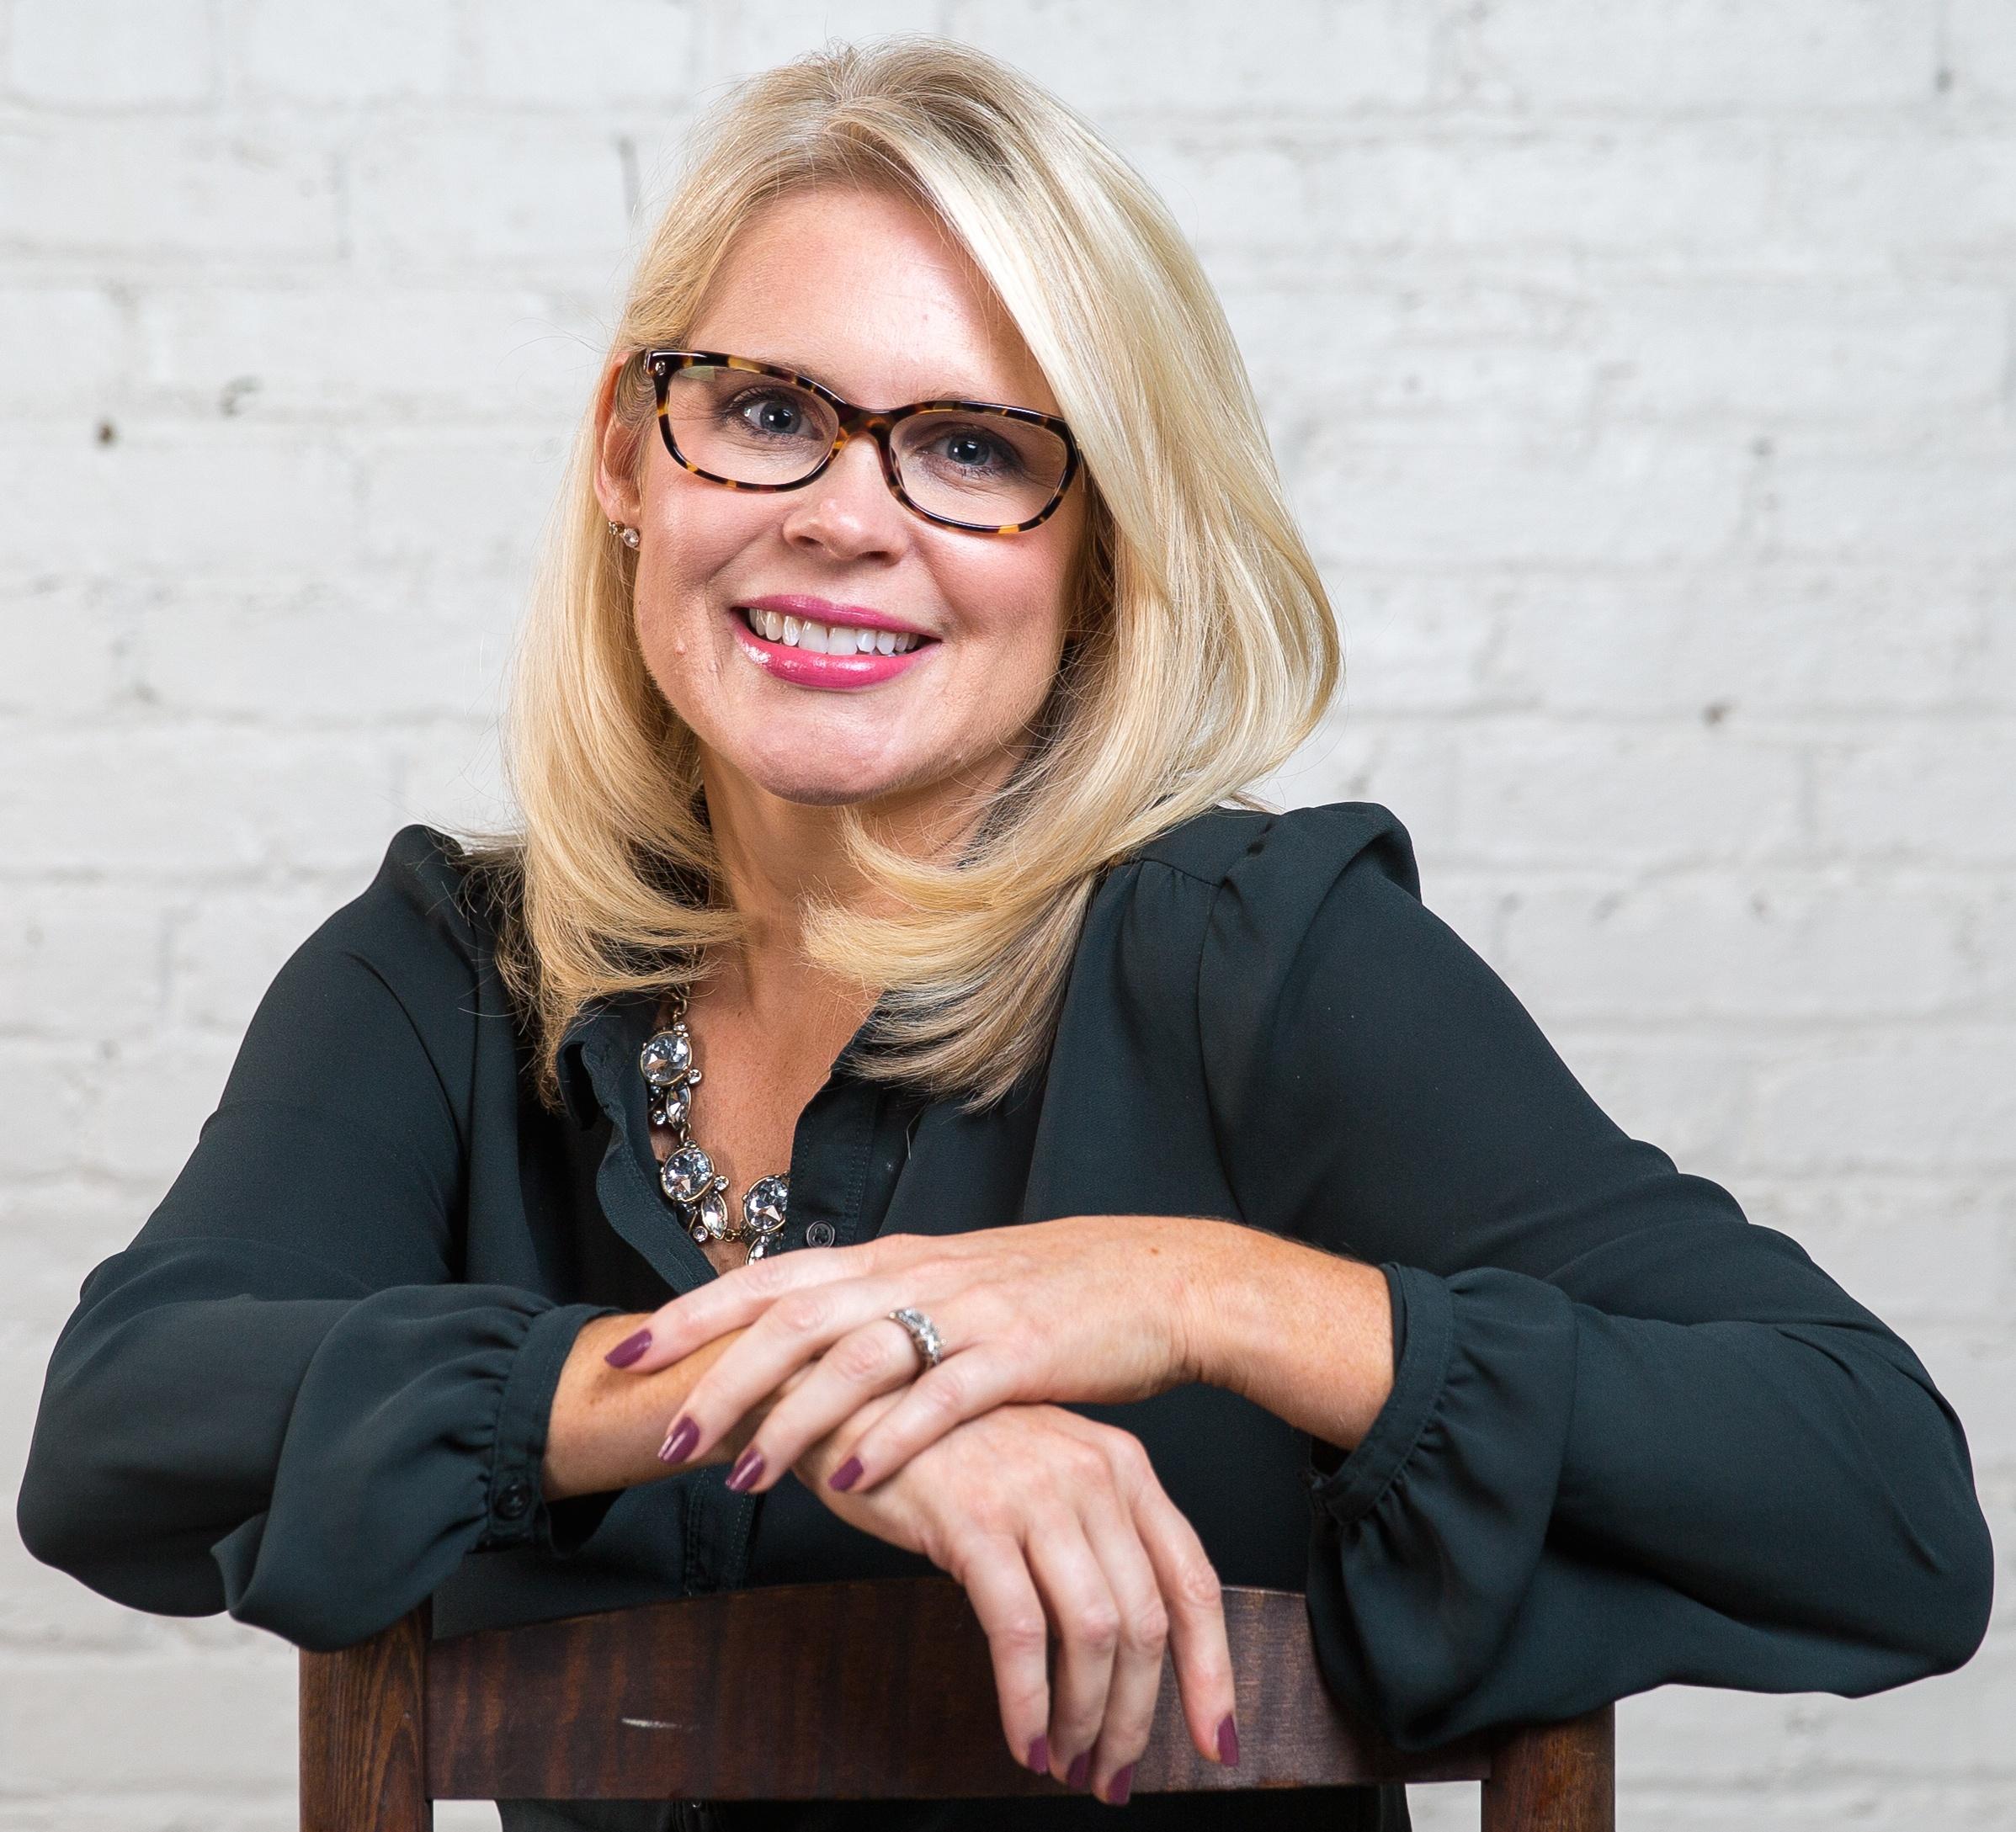 Hollie Geitner Vice President, Client Services hollie .geitner@wordwritepr.com